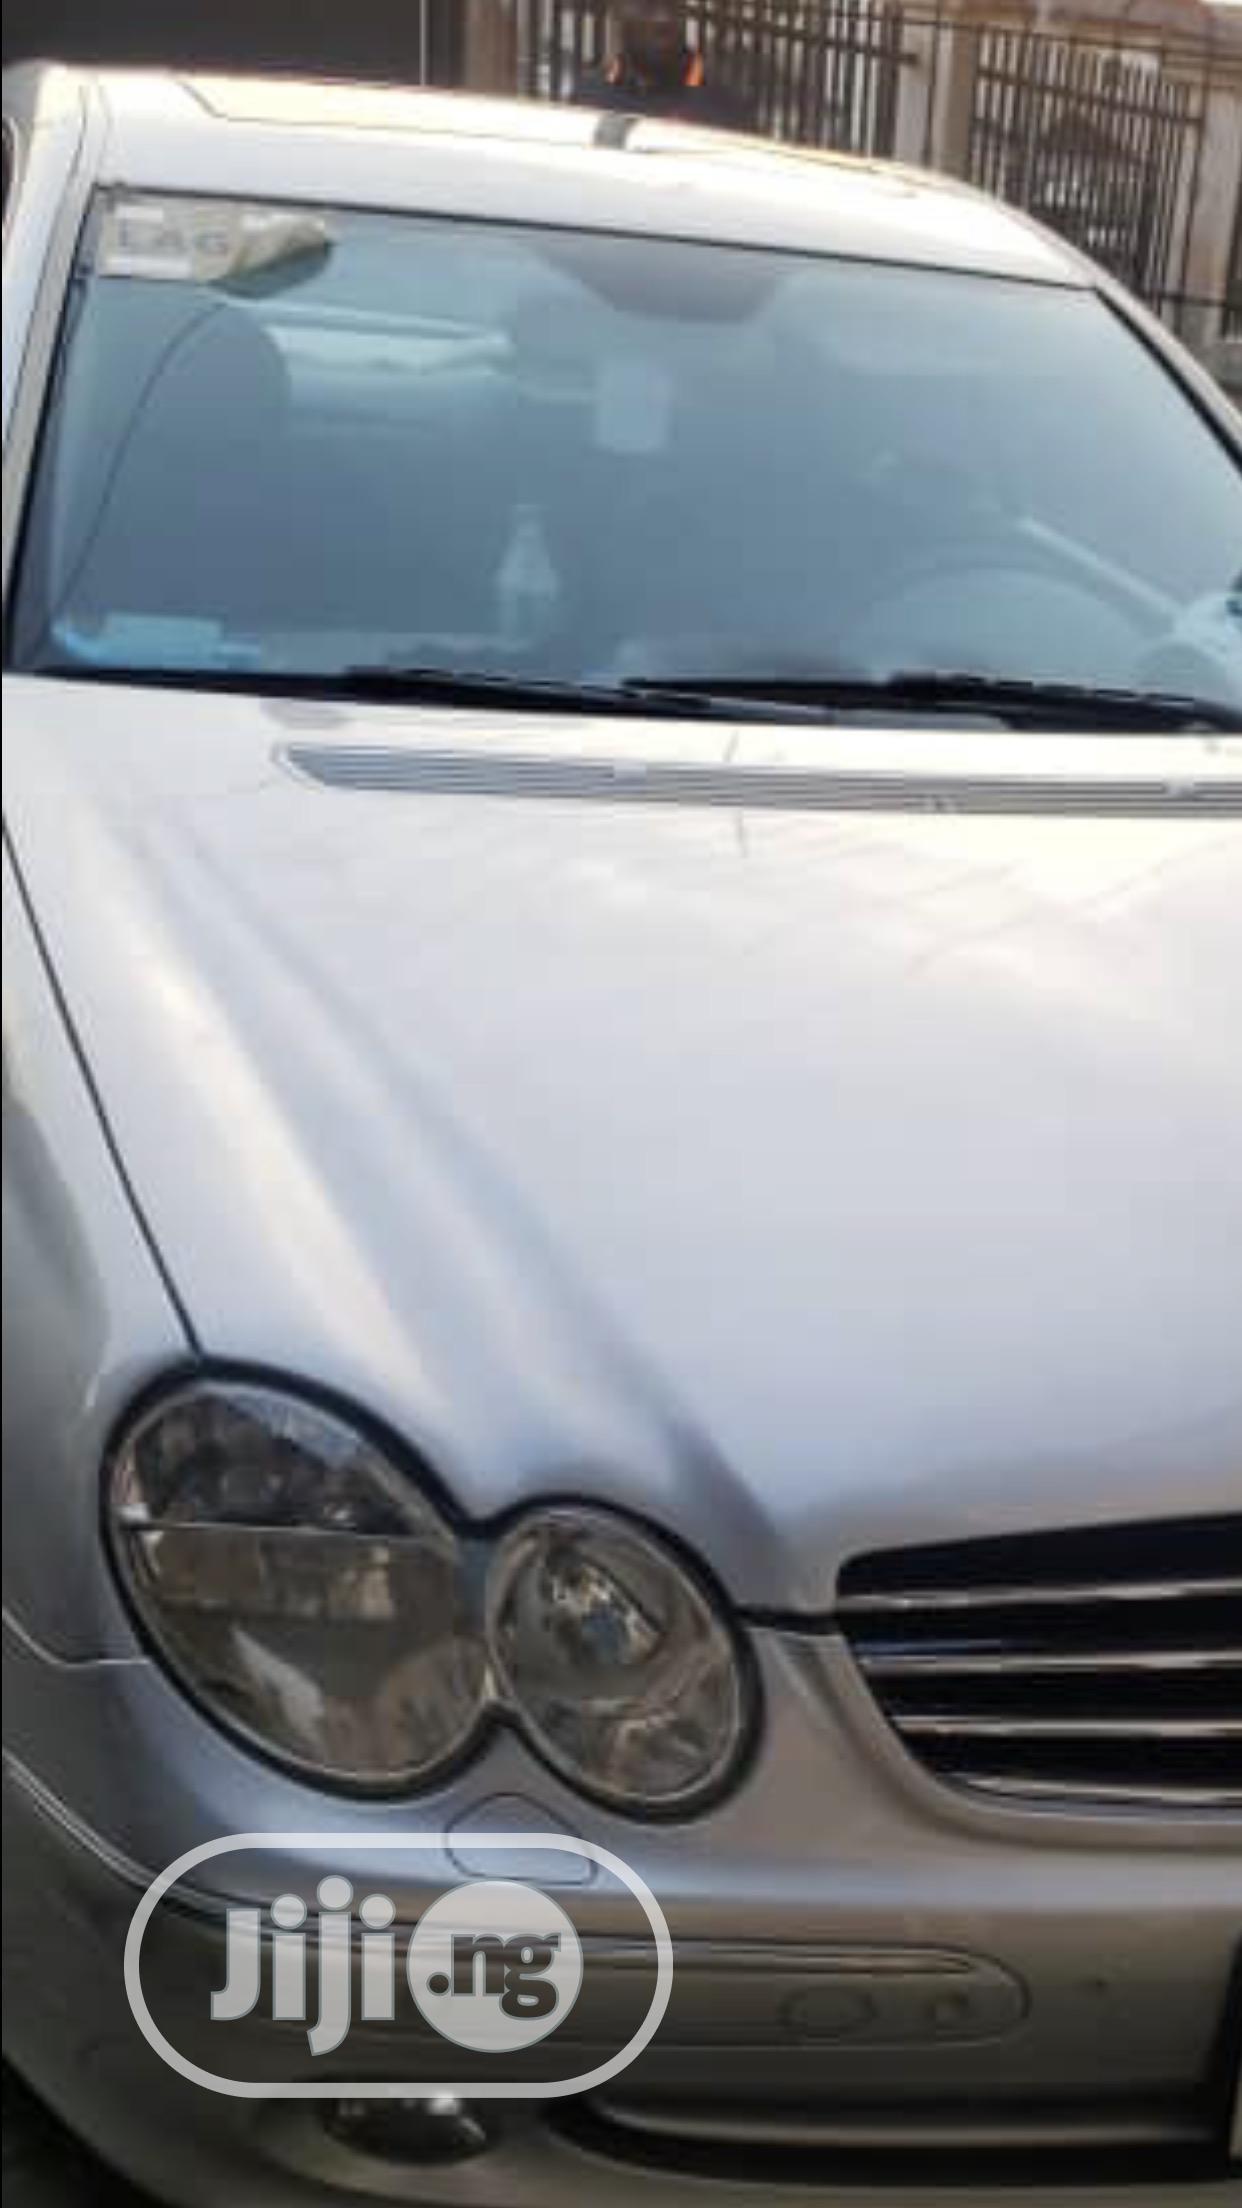 Archive: Mercedes-Benz CLK 2005 55 AMG Silver